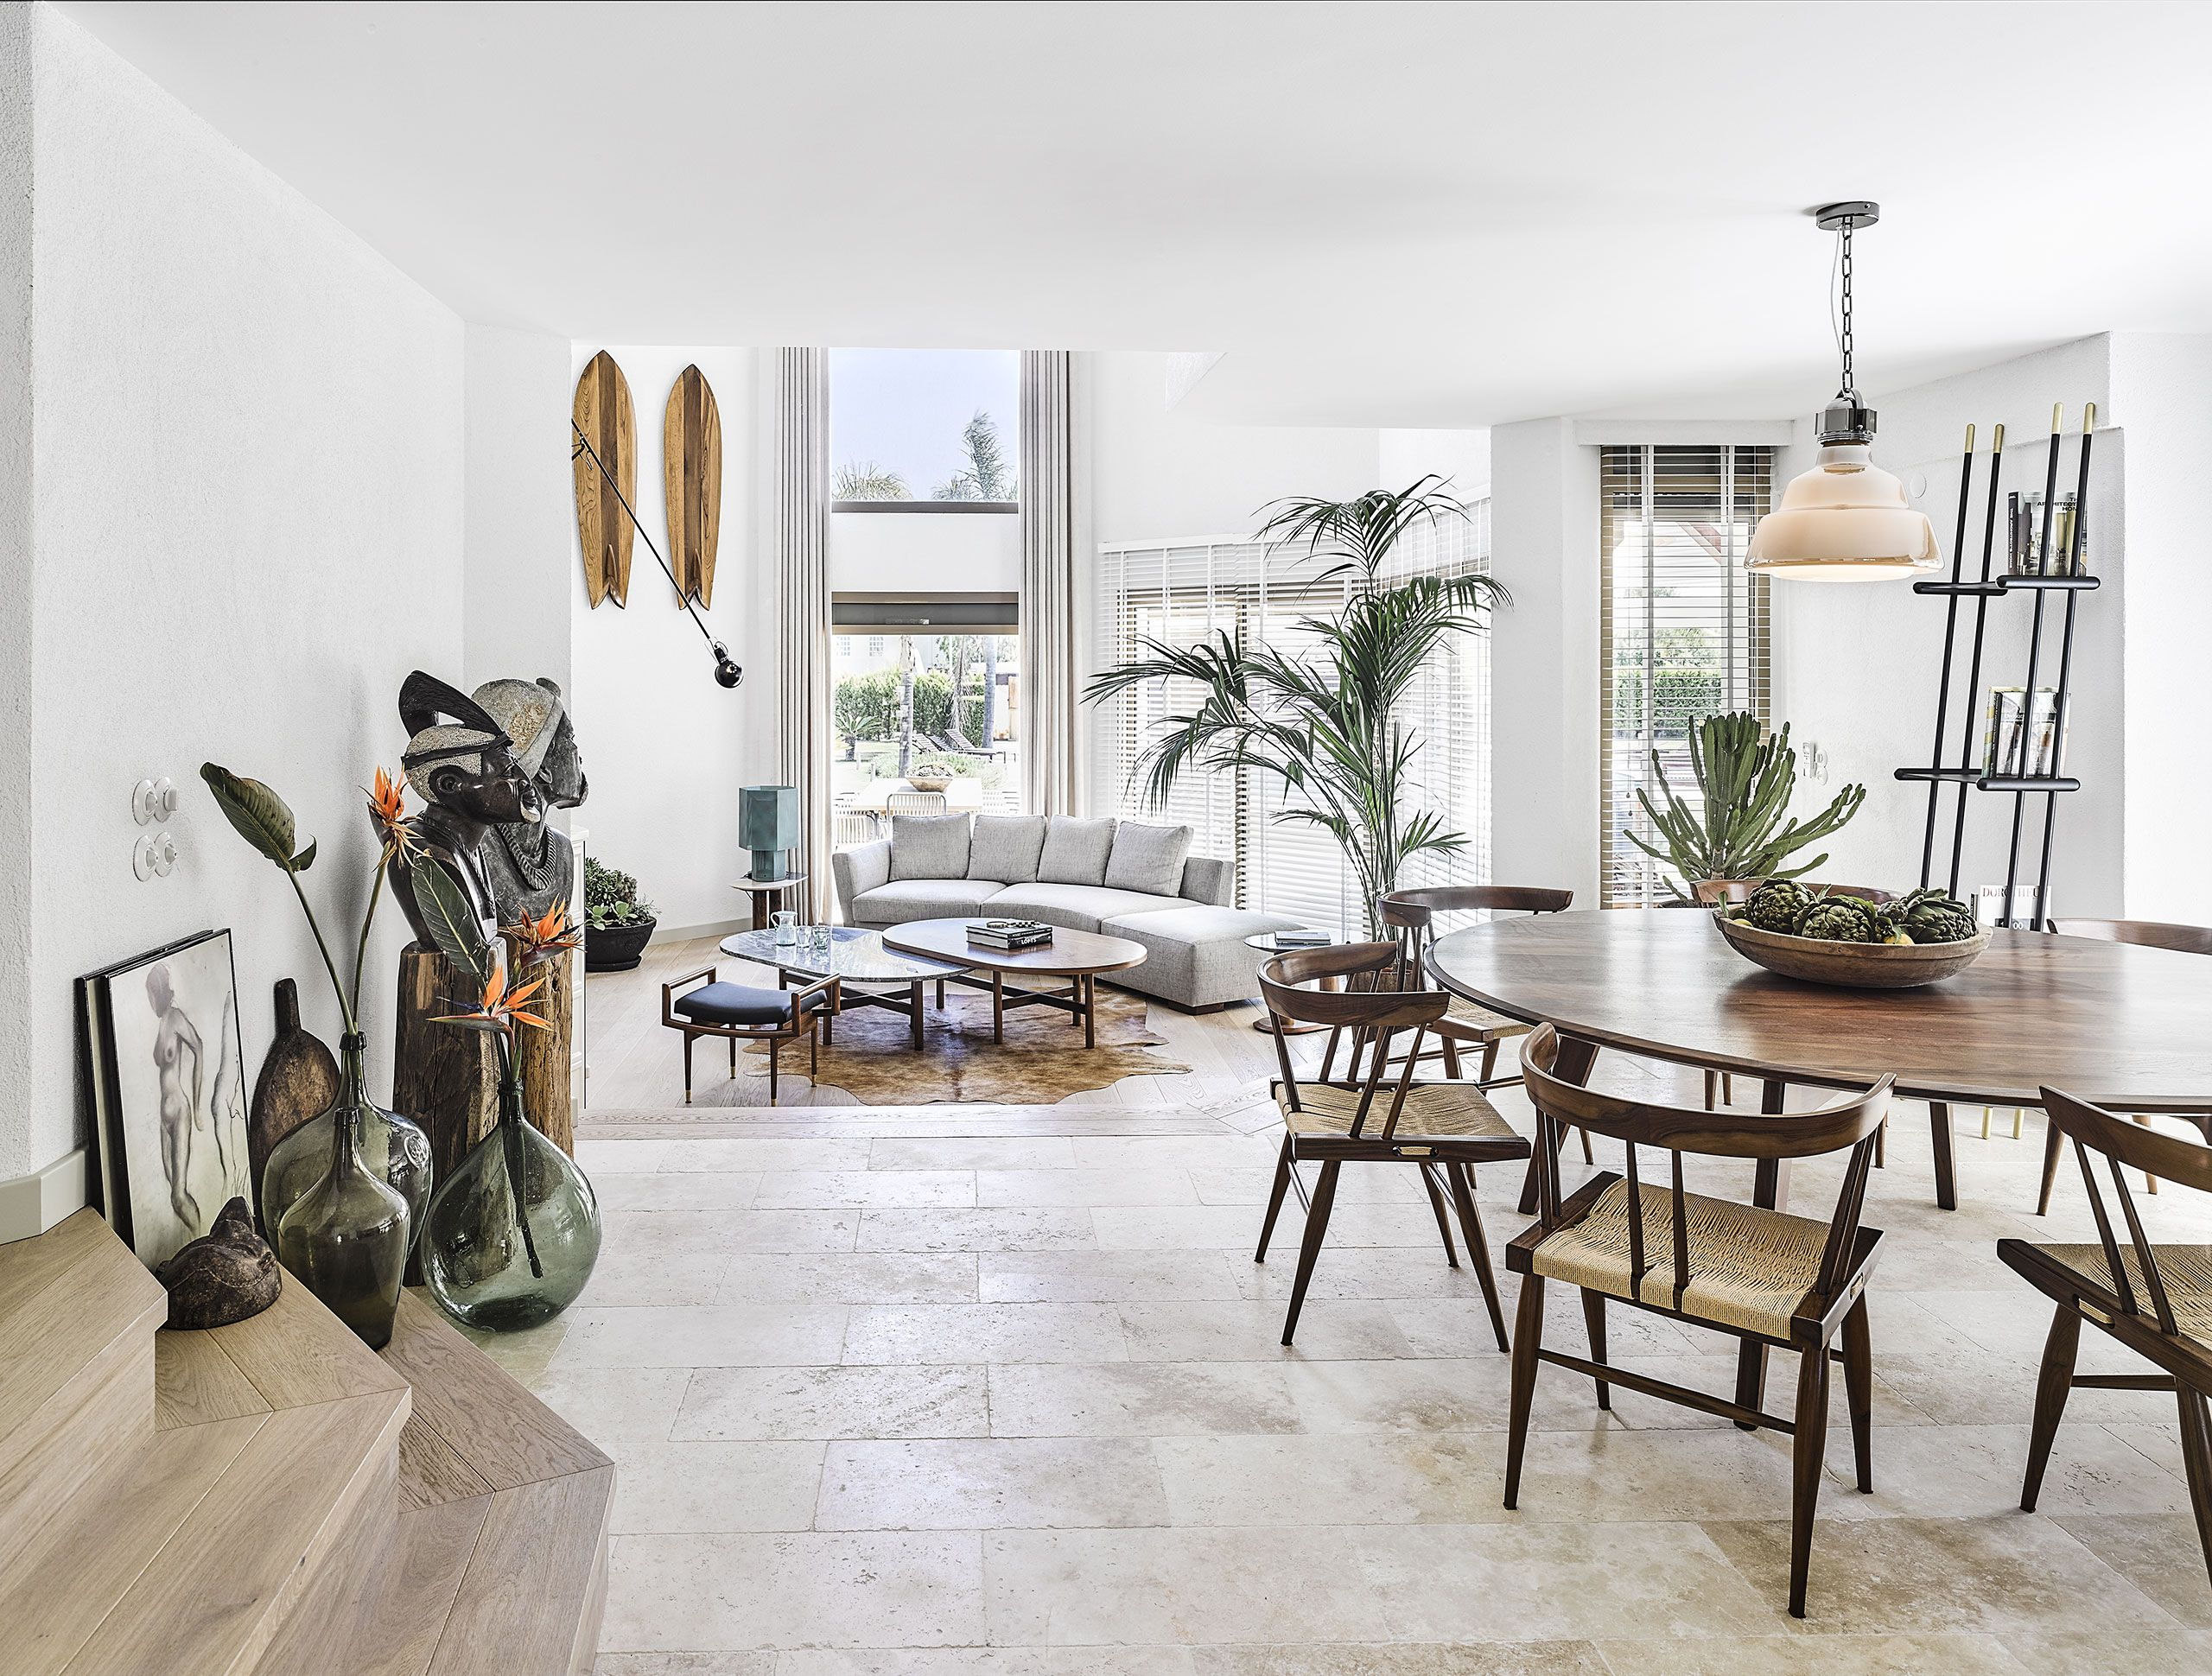 Mediterranean Summer House Marries Scandinavian South American Design In Cesme Yatzer Elegant Interiors Interior Interior Design